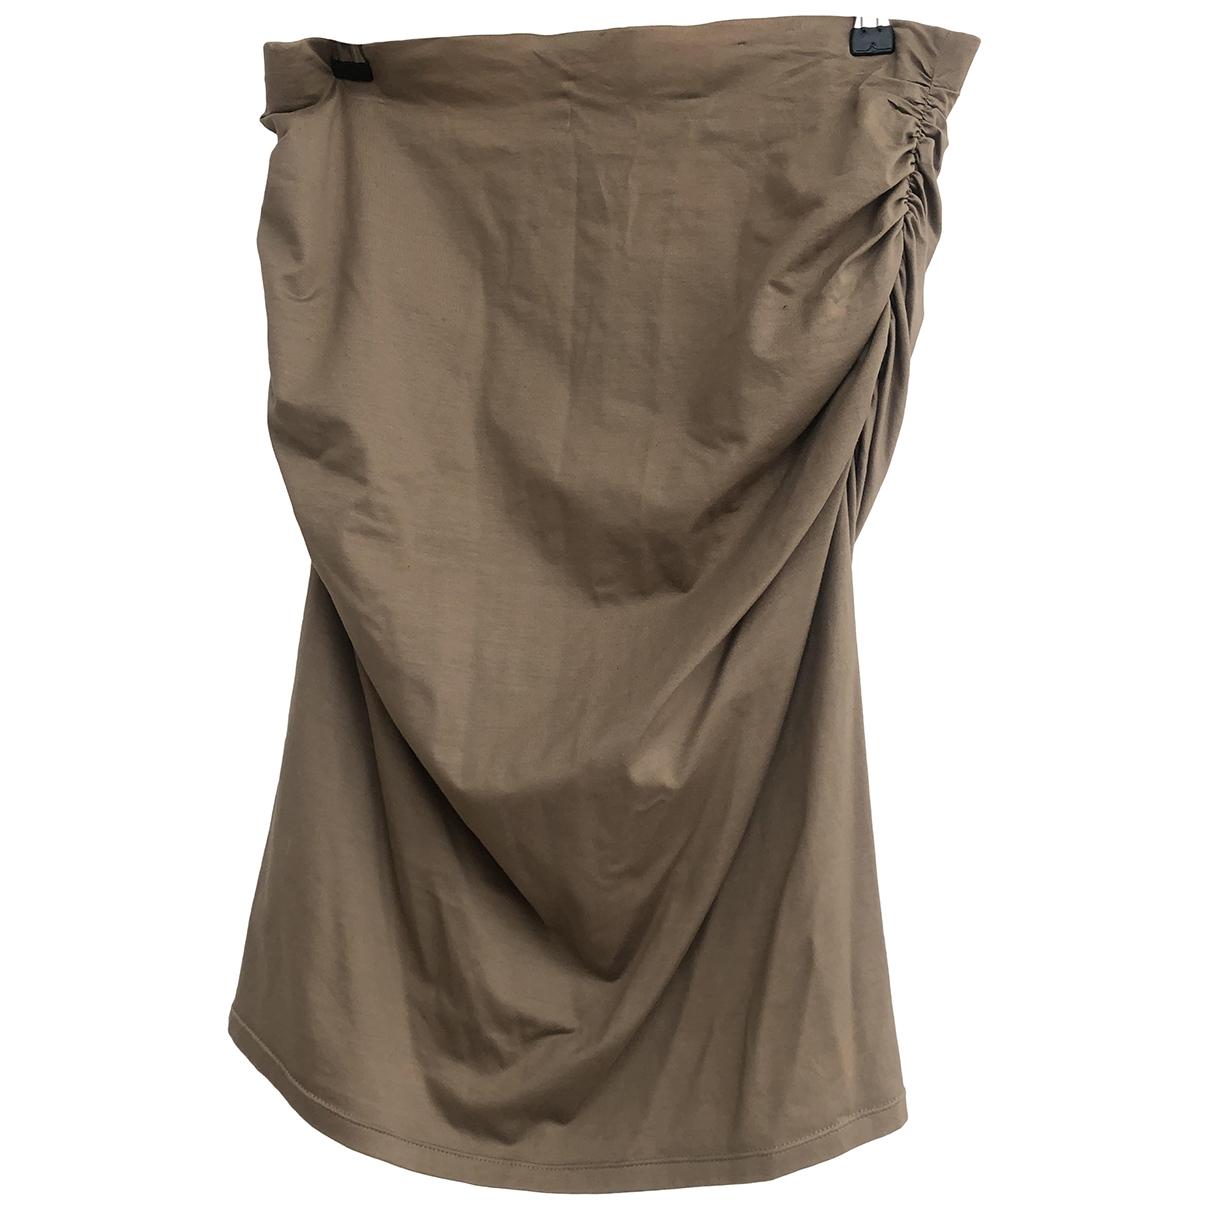 Paule Ka \N Beige Cotton skirt for Women L International